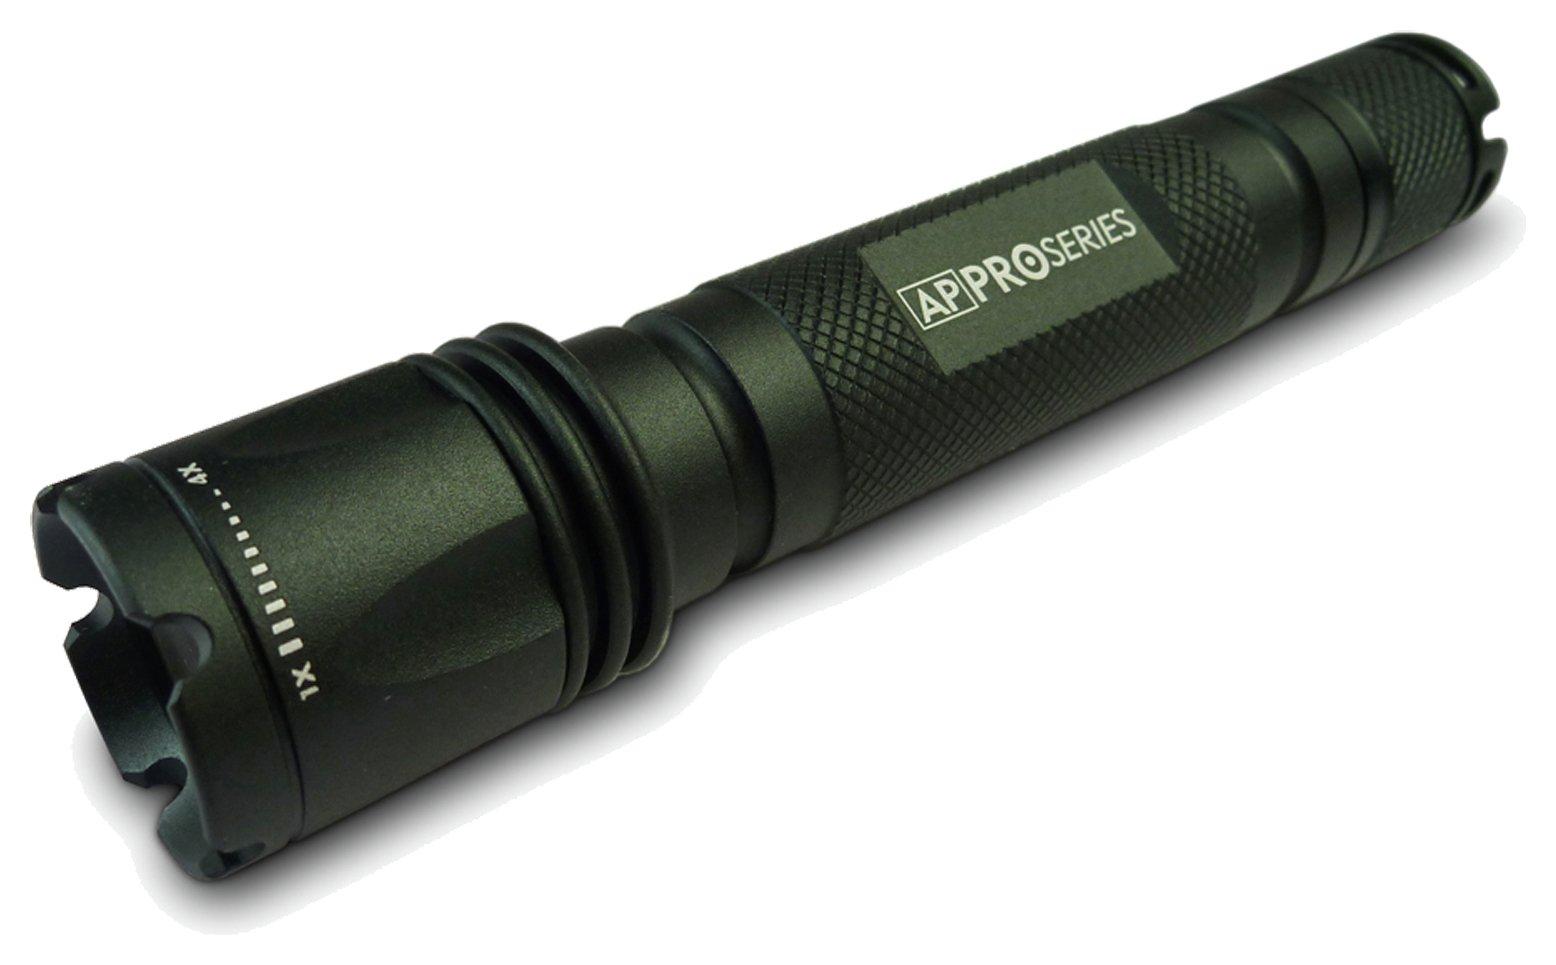 Image of Pro Series - 300 LuMen's CREE Torch